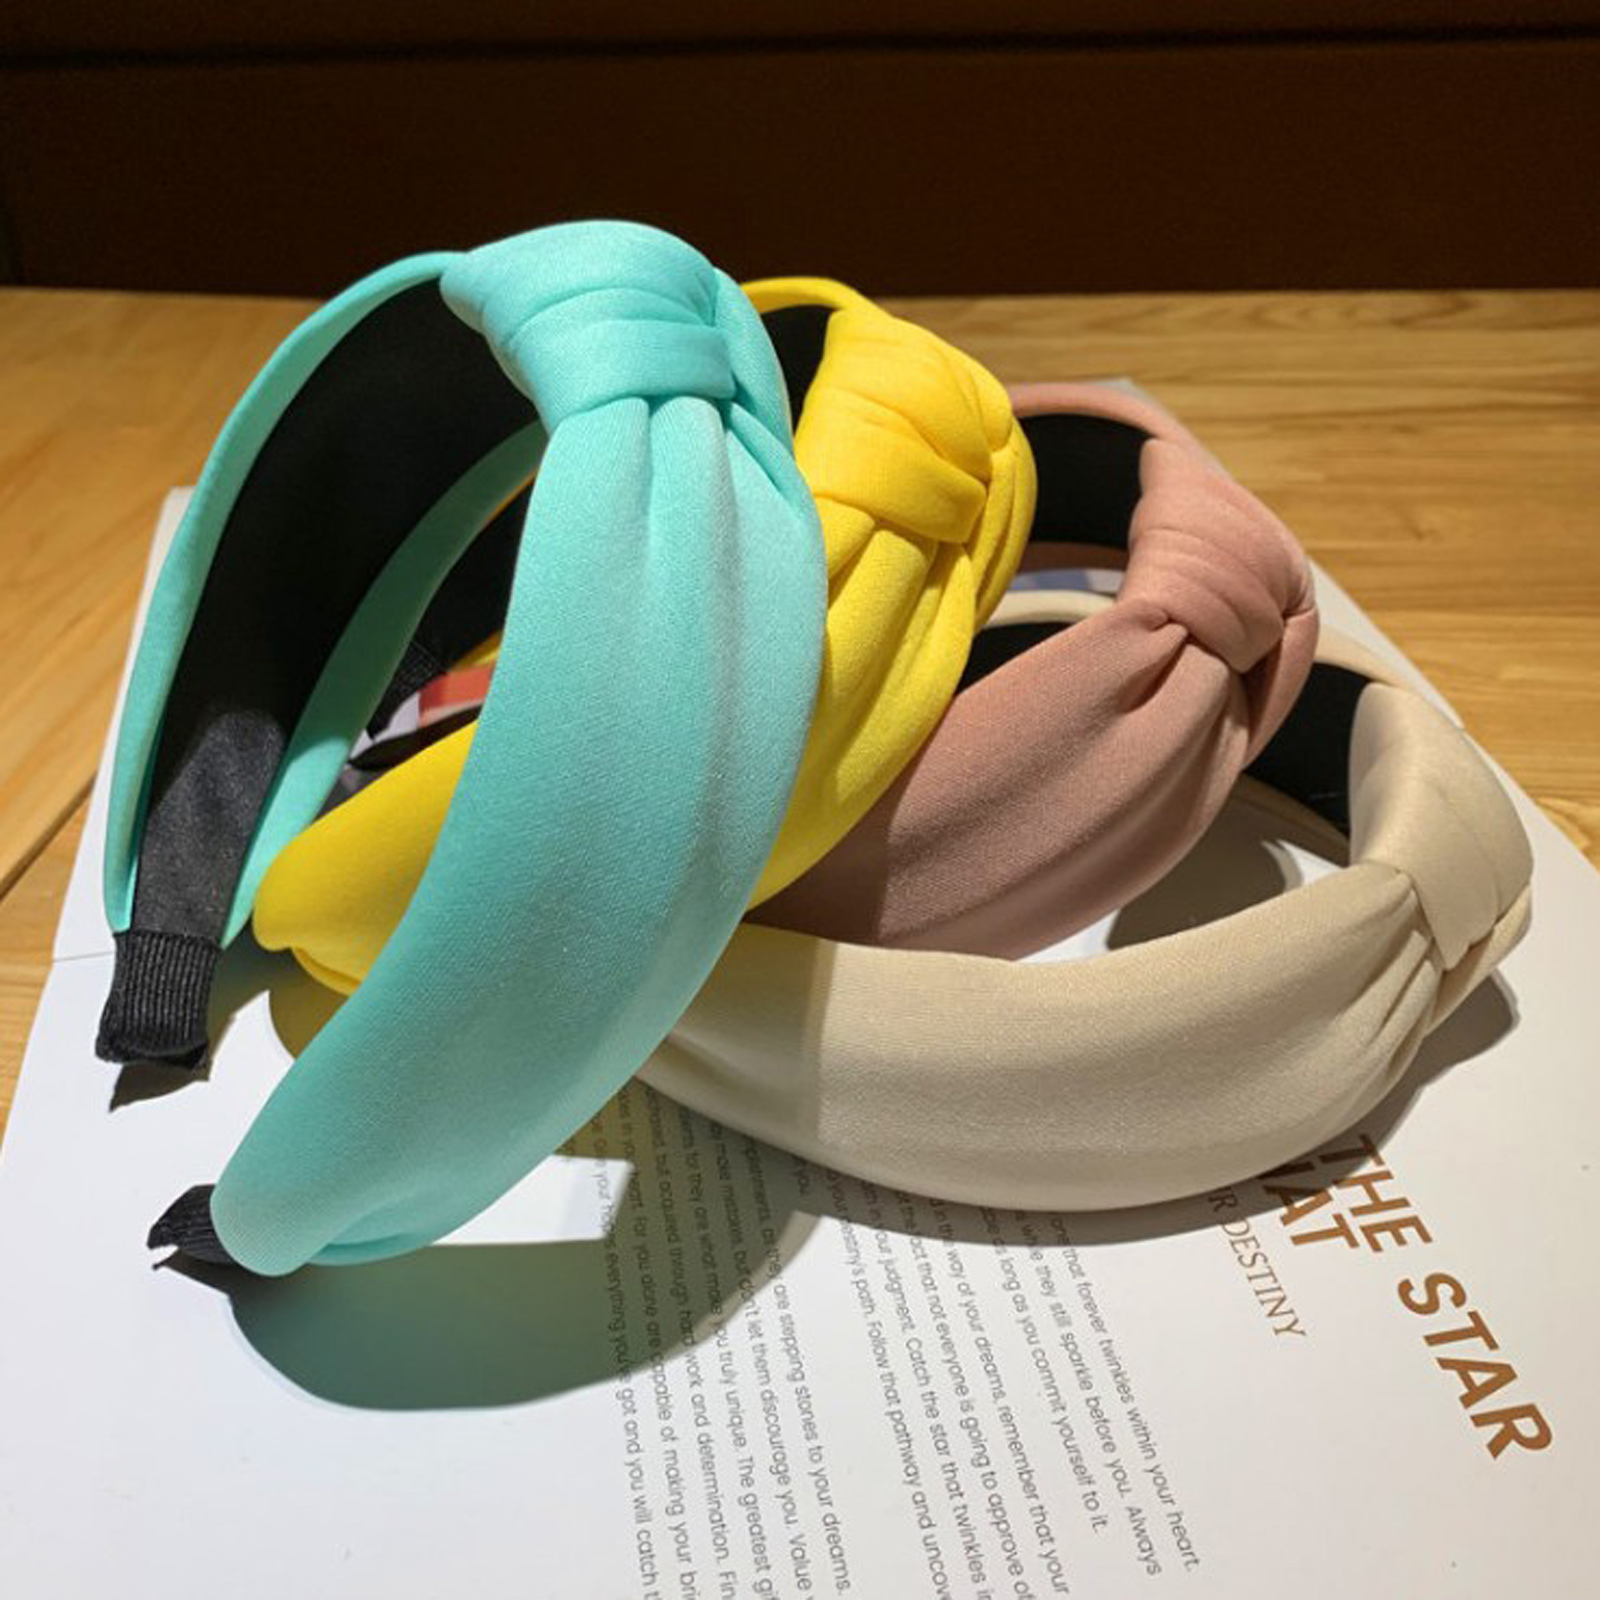 New Faashion Solid Headband Women High Soft Hairband Adult Wide Side Hih Elastic Sponge Material Turban Headwear Wholesale